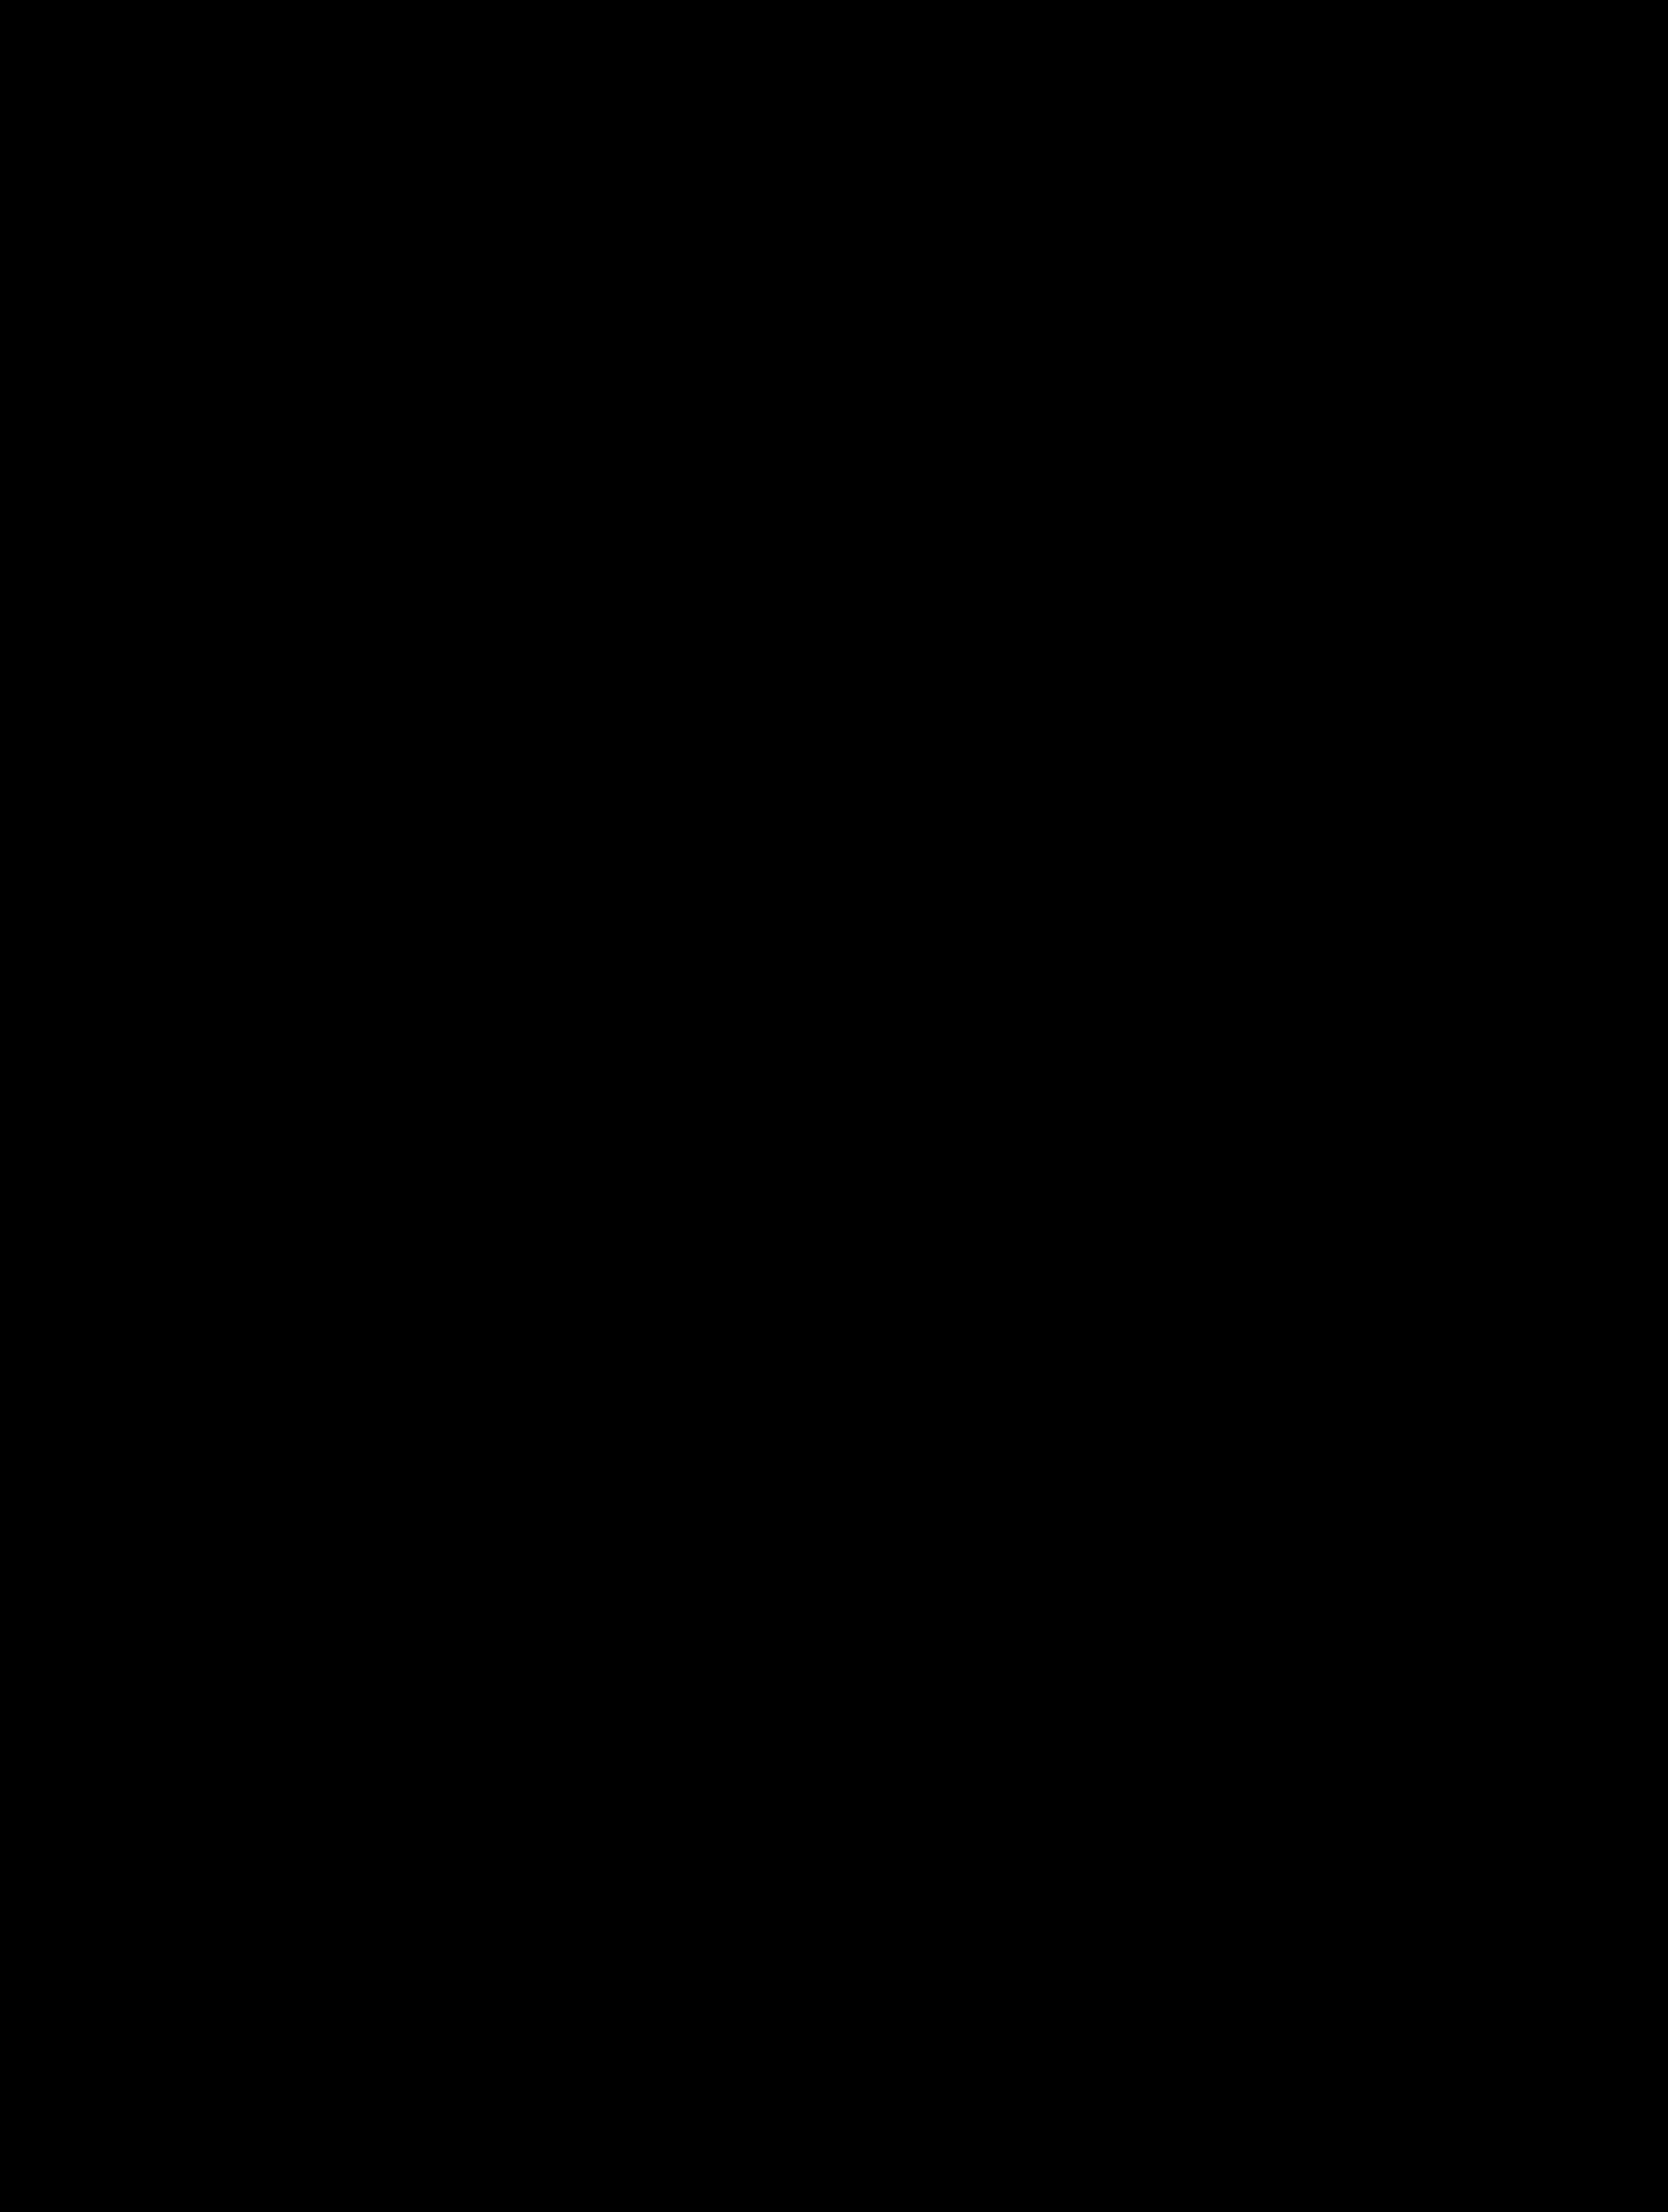 Loz tattooer   black on white